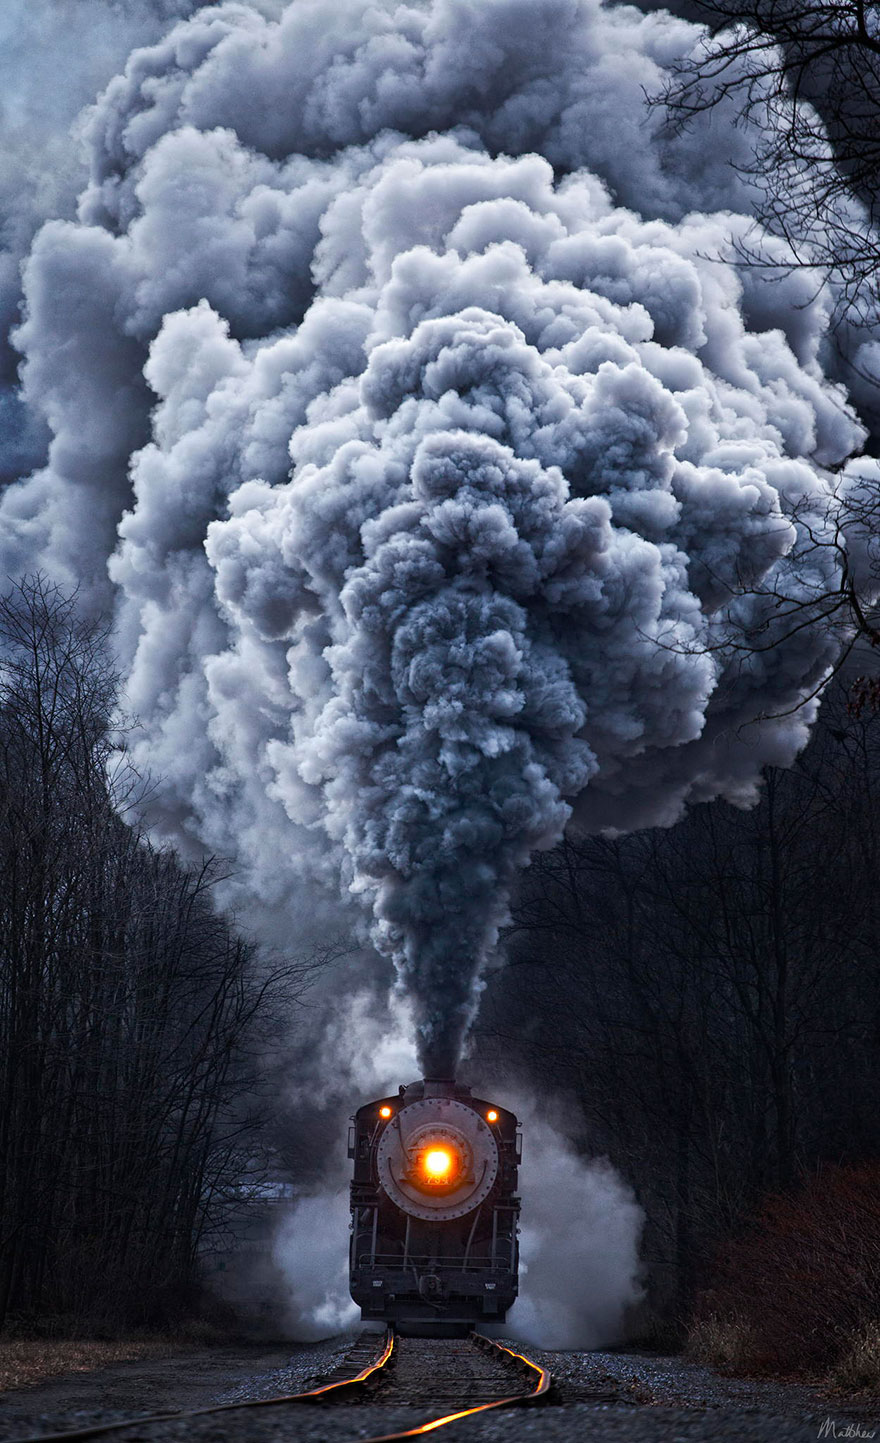 train-photos-matthew-malkiewicz-1